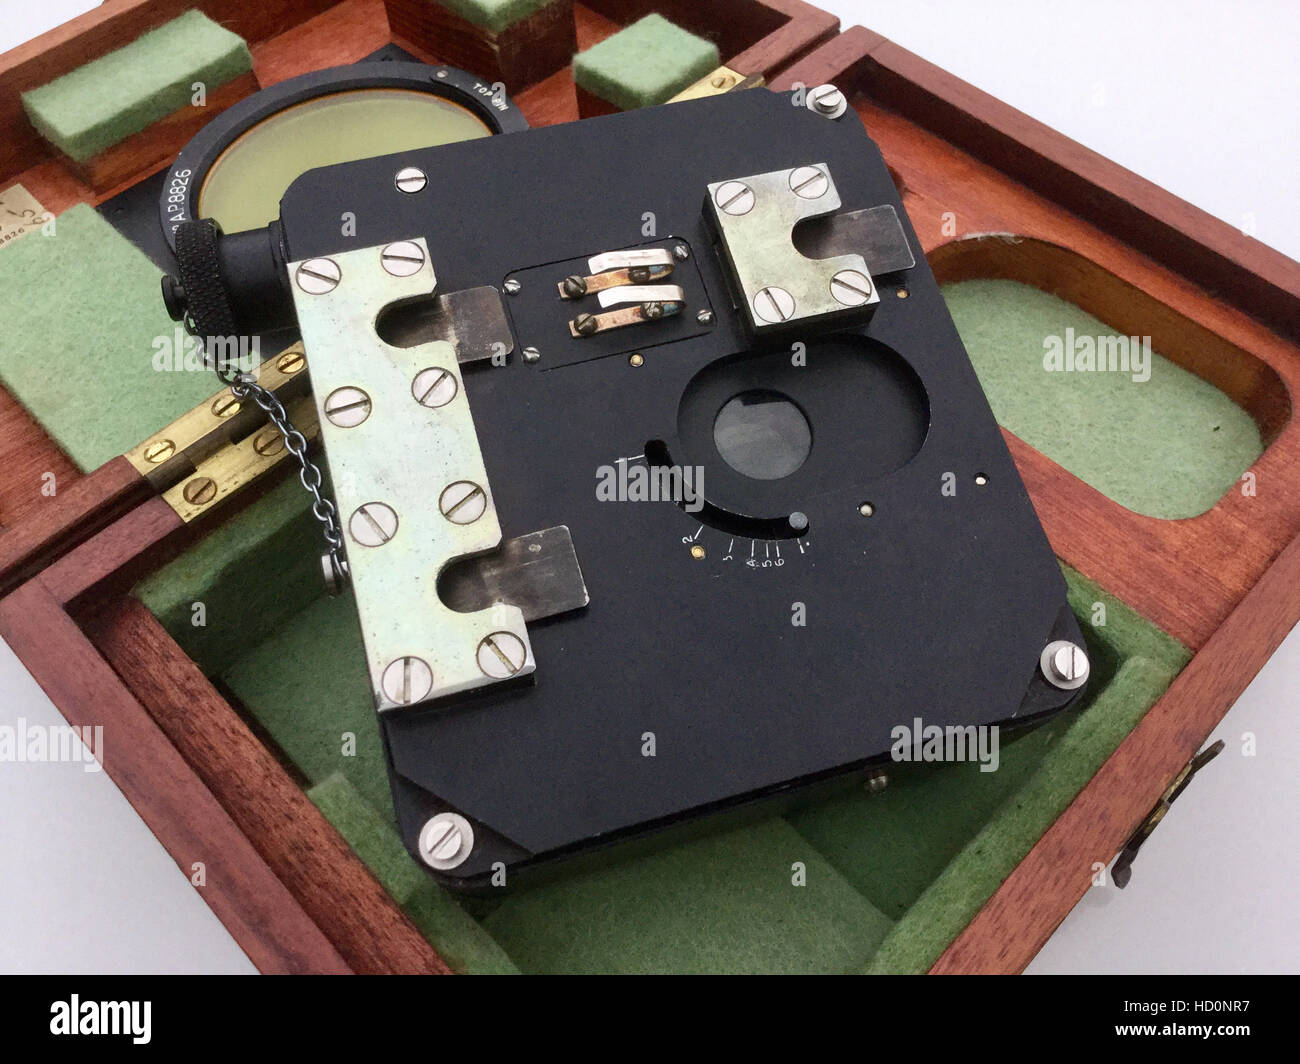 occluded eye gunsight camera - Stock Image